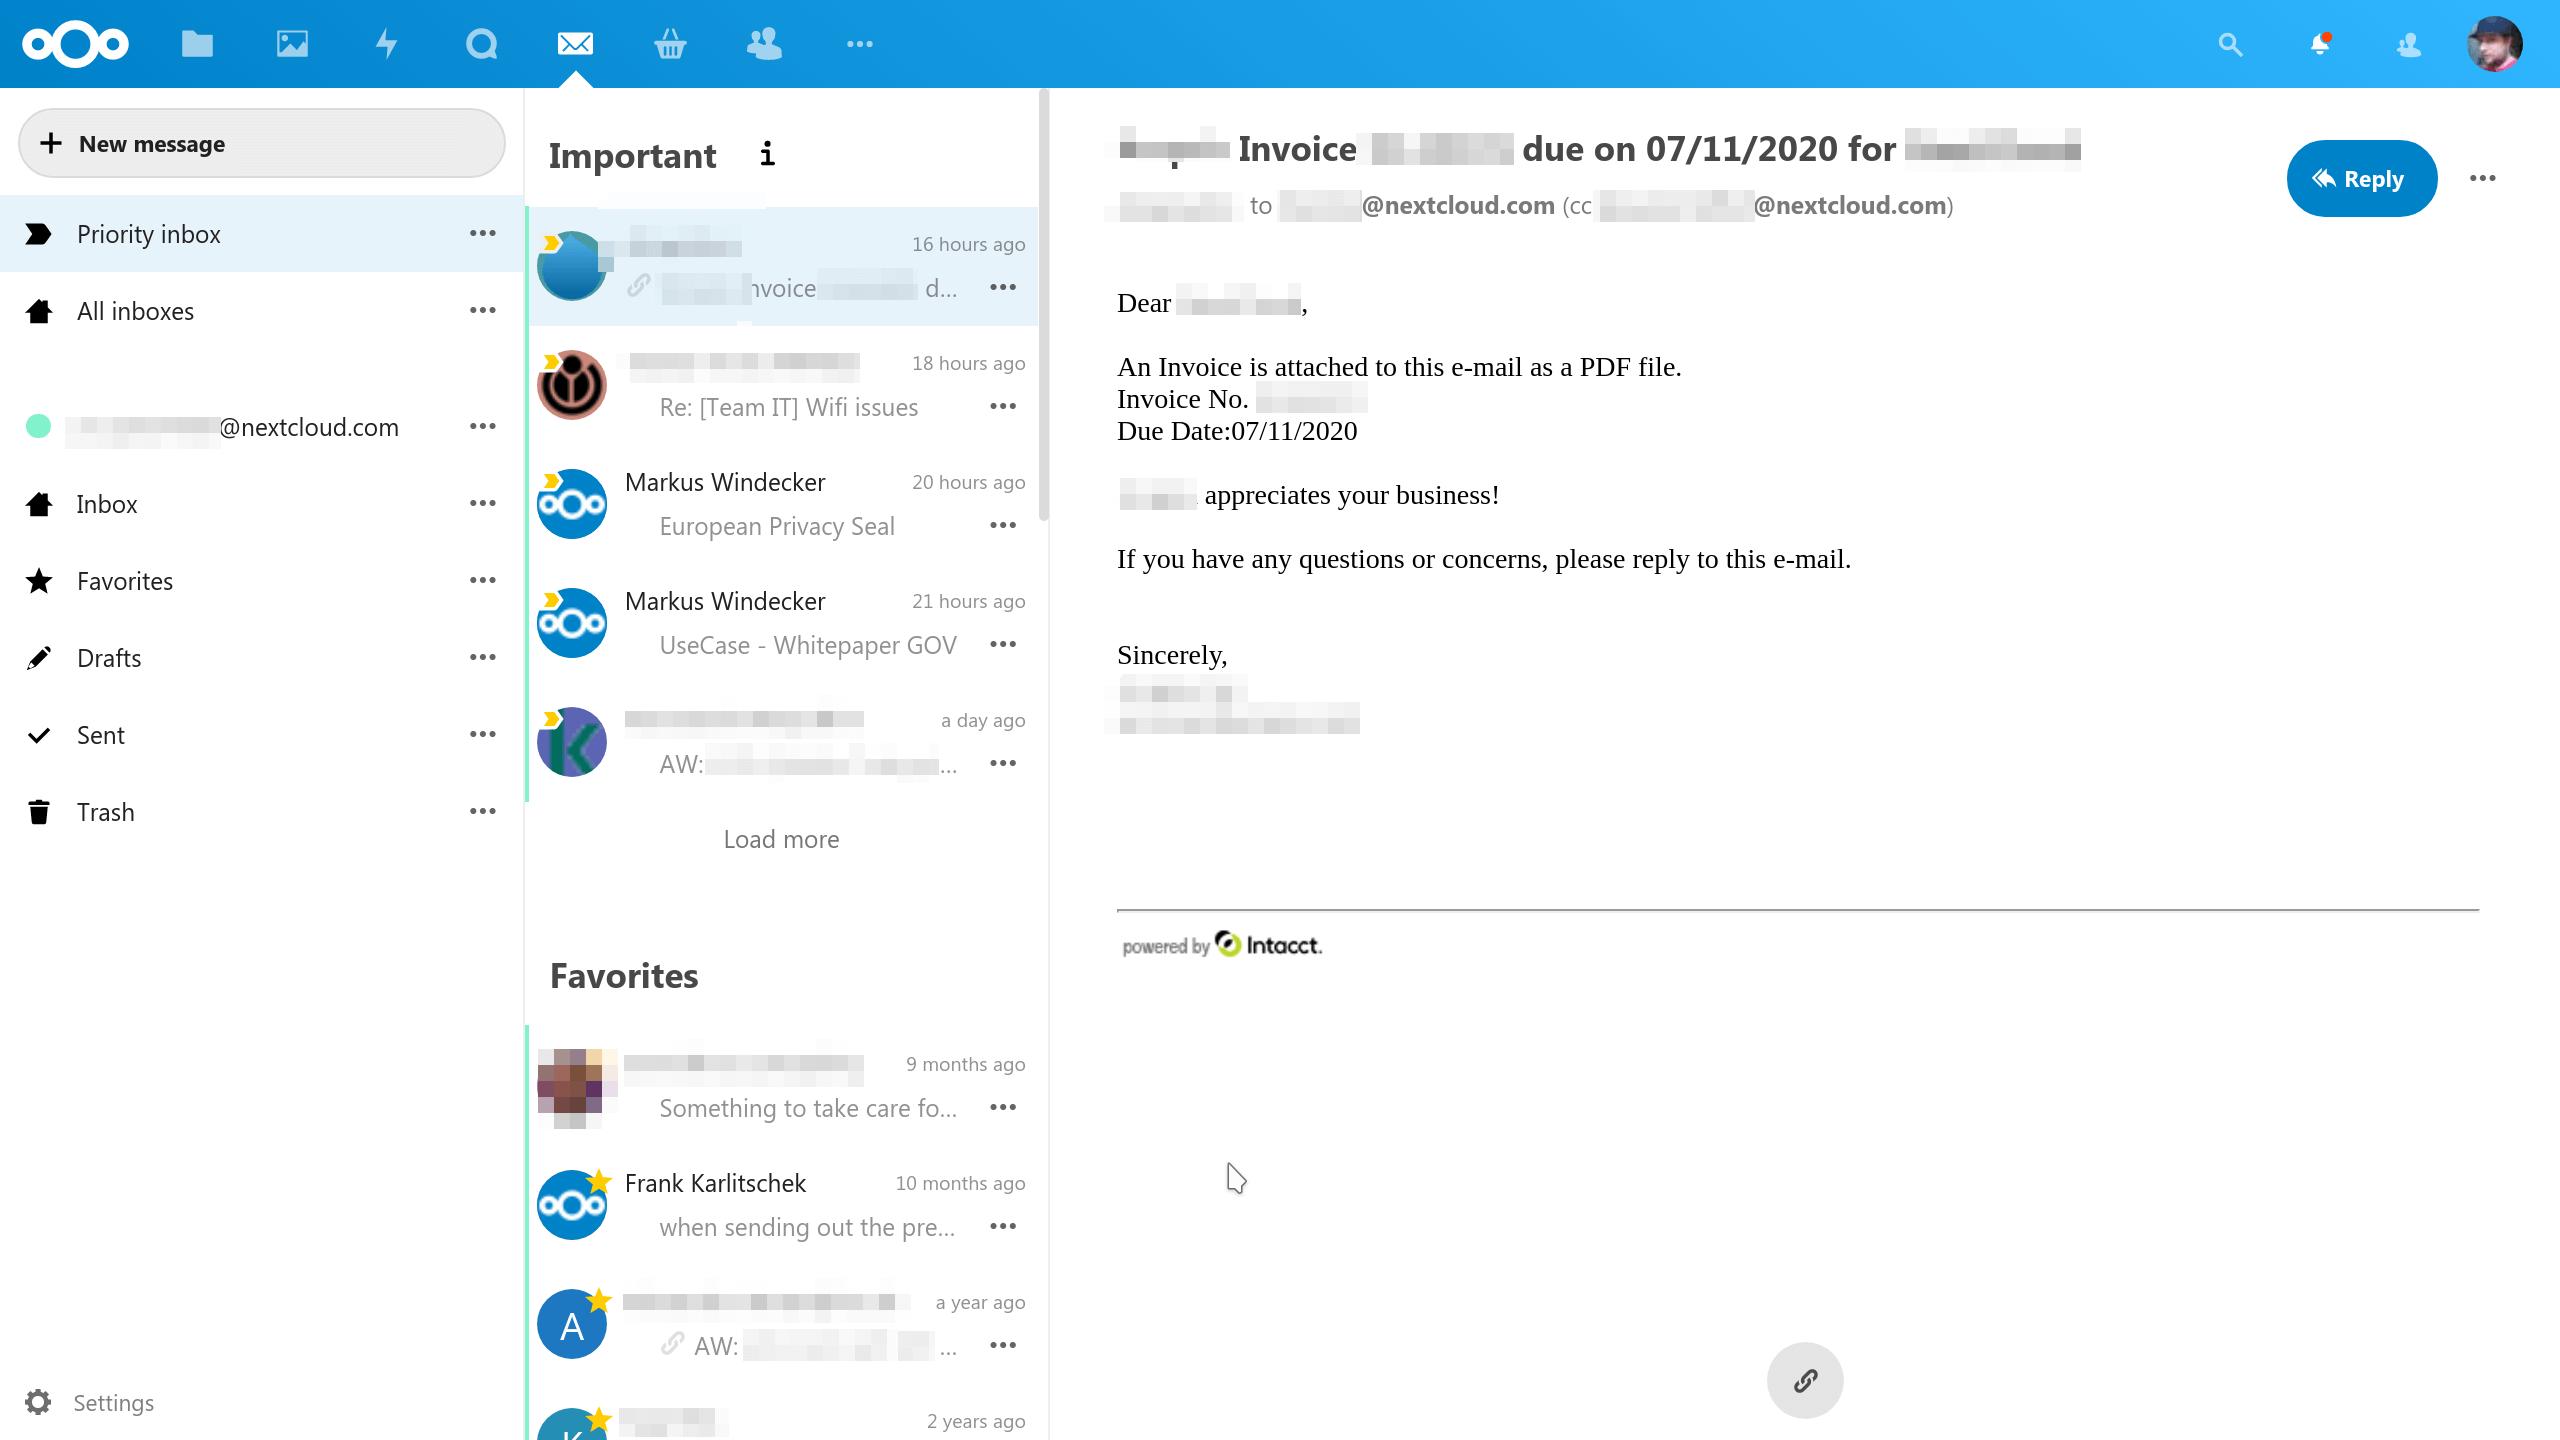 screenshot of the priority inbox